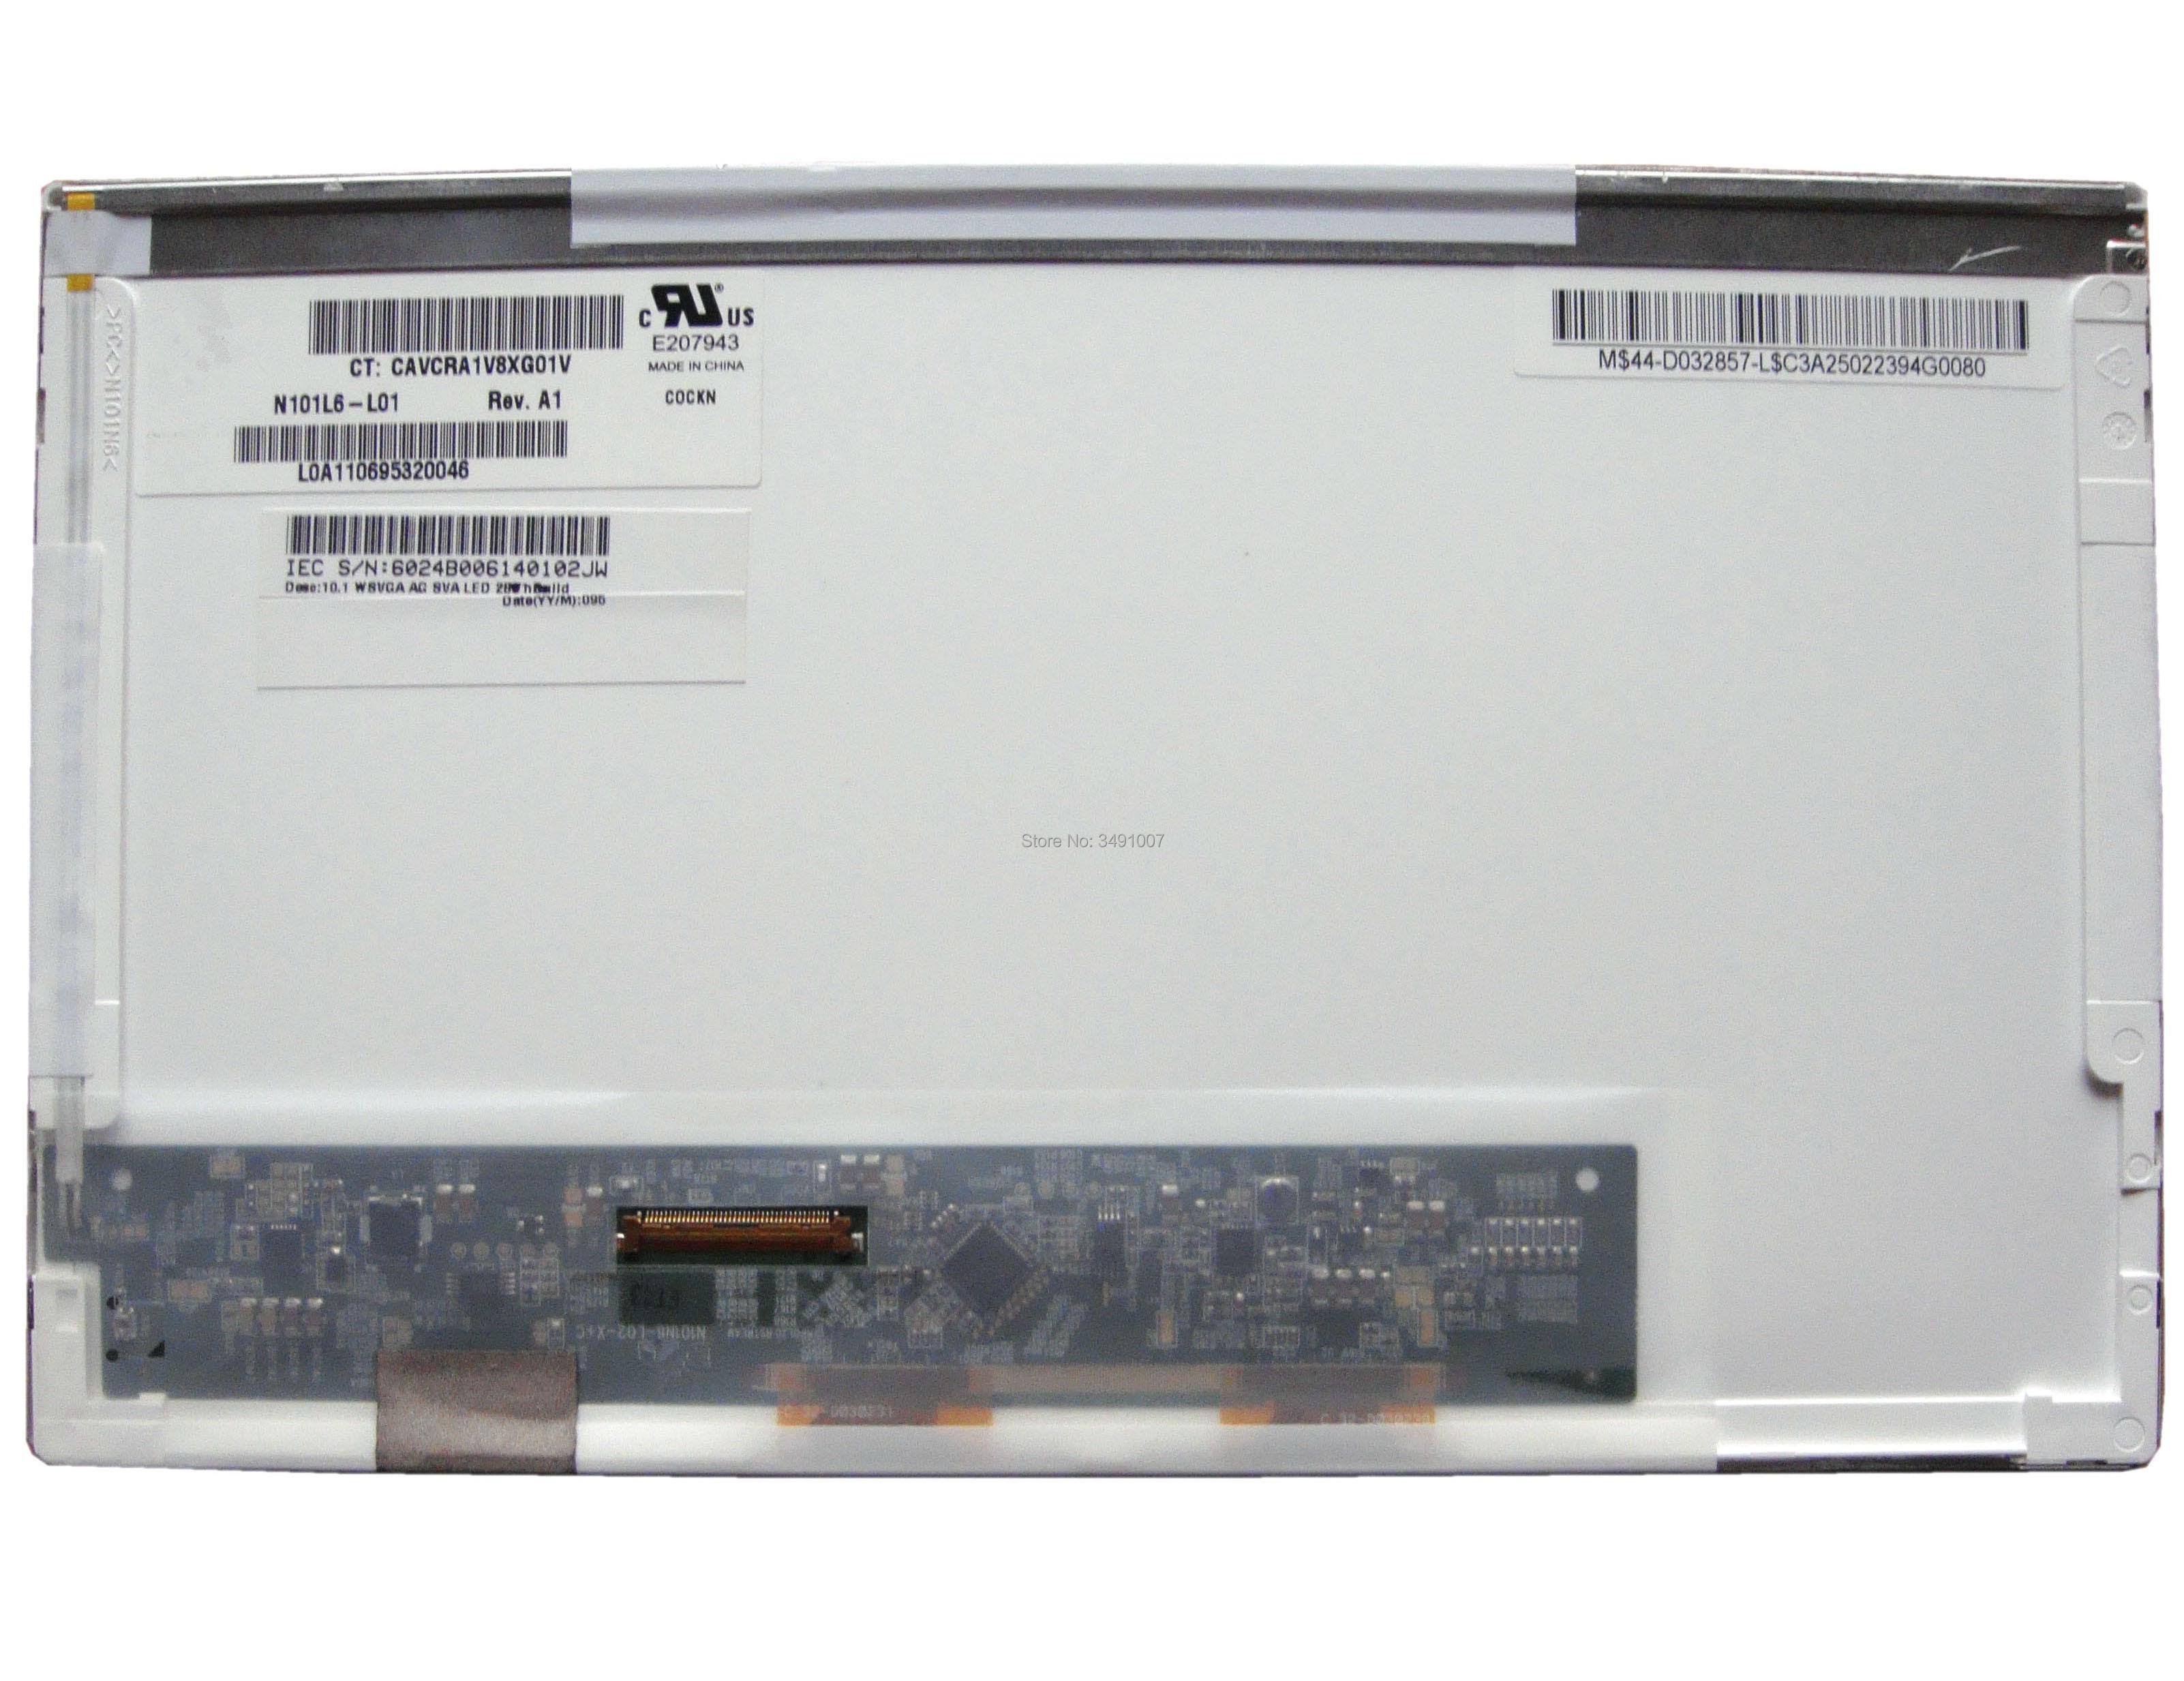 Ugello per fughe 32//35 mm adatto per Siemens VS 06 G 2001 synchropower